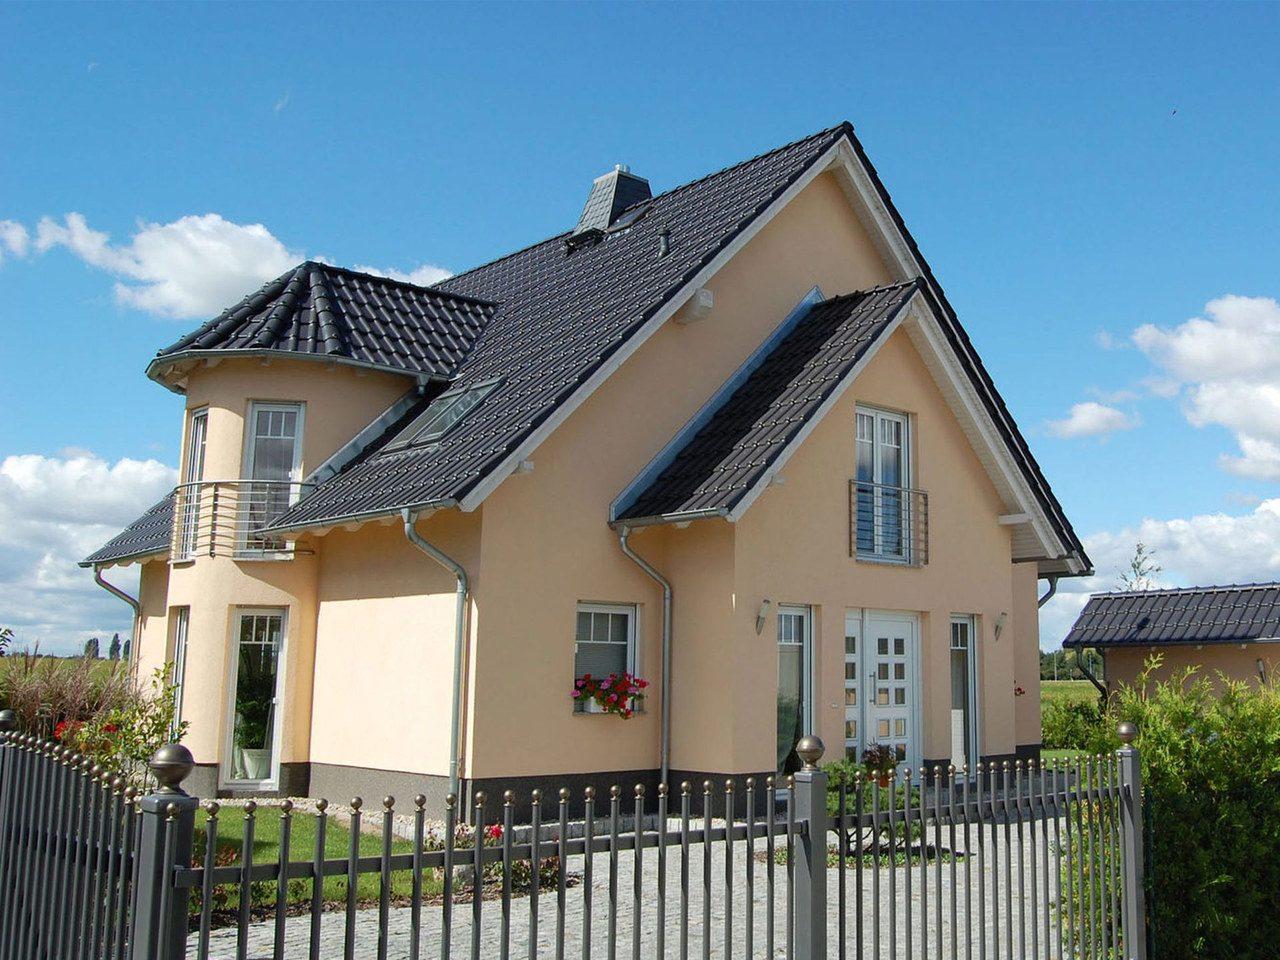 Rothenseer Baugesellschaft - Haus Am See